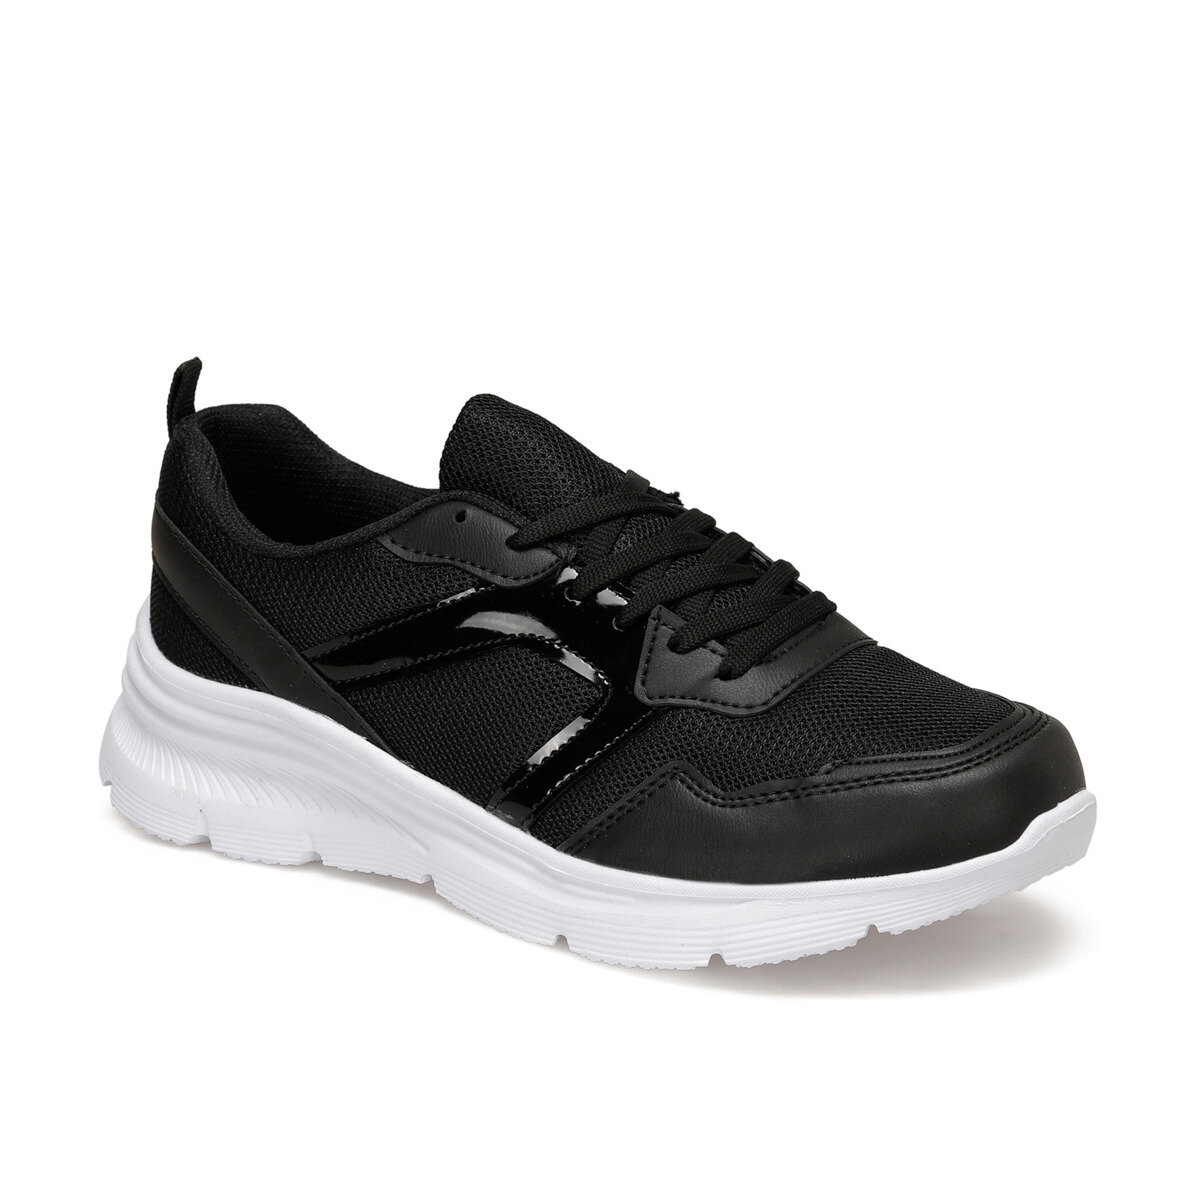 FLO JULIA W Black Women 'S Running Shoe Torex